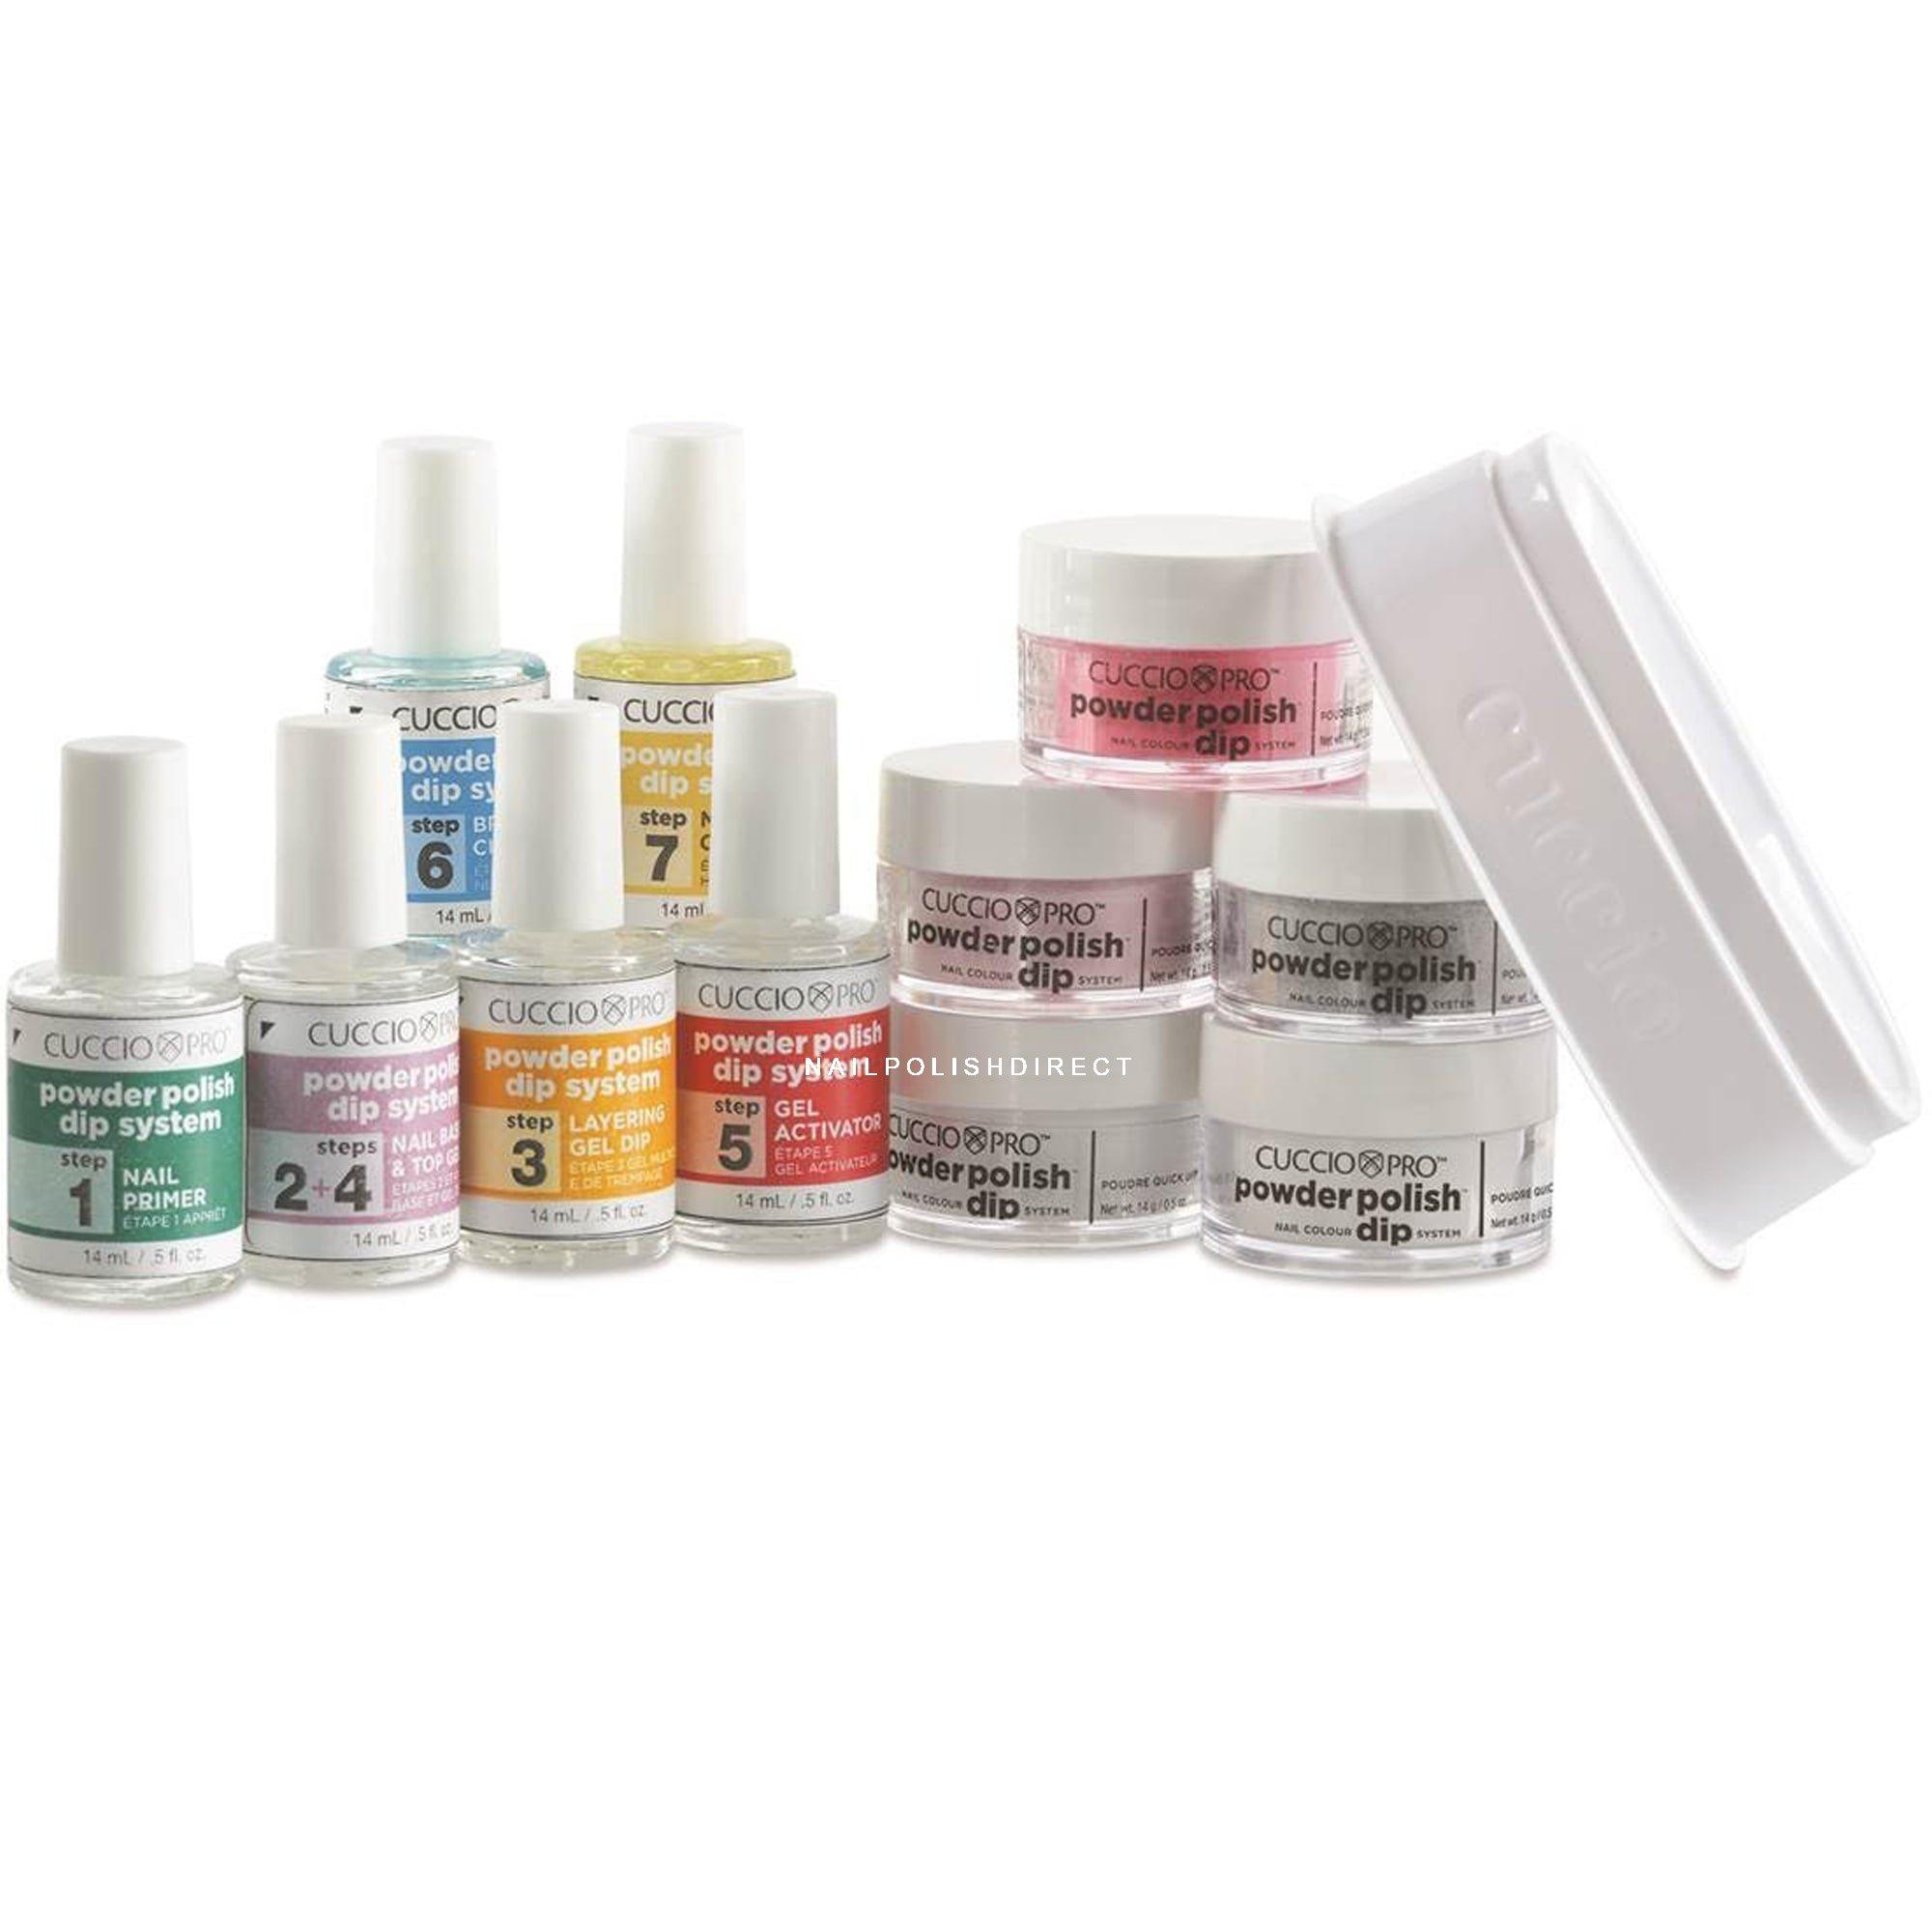 Cuccio Starter Kit - Powder Polish Nail Colour Dipping System (5530)